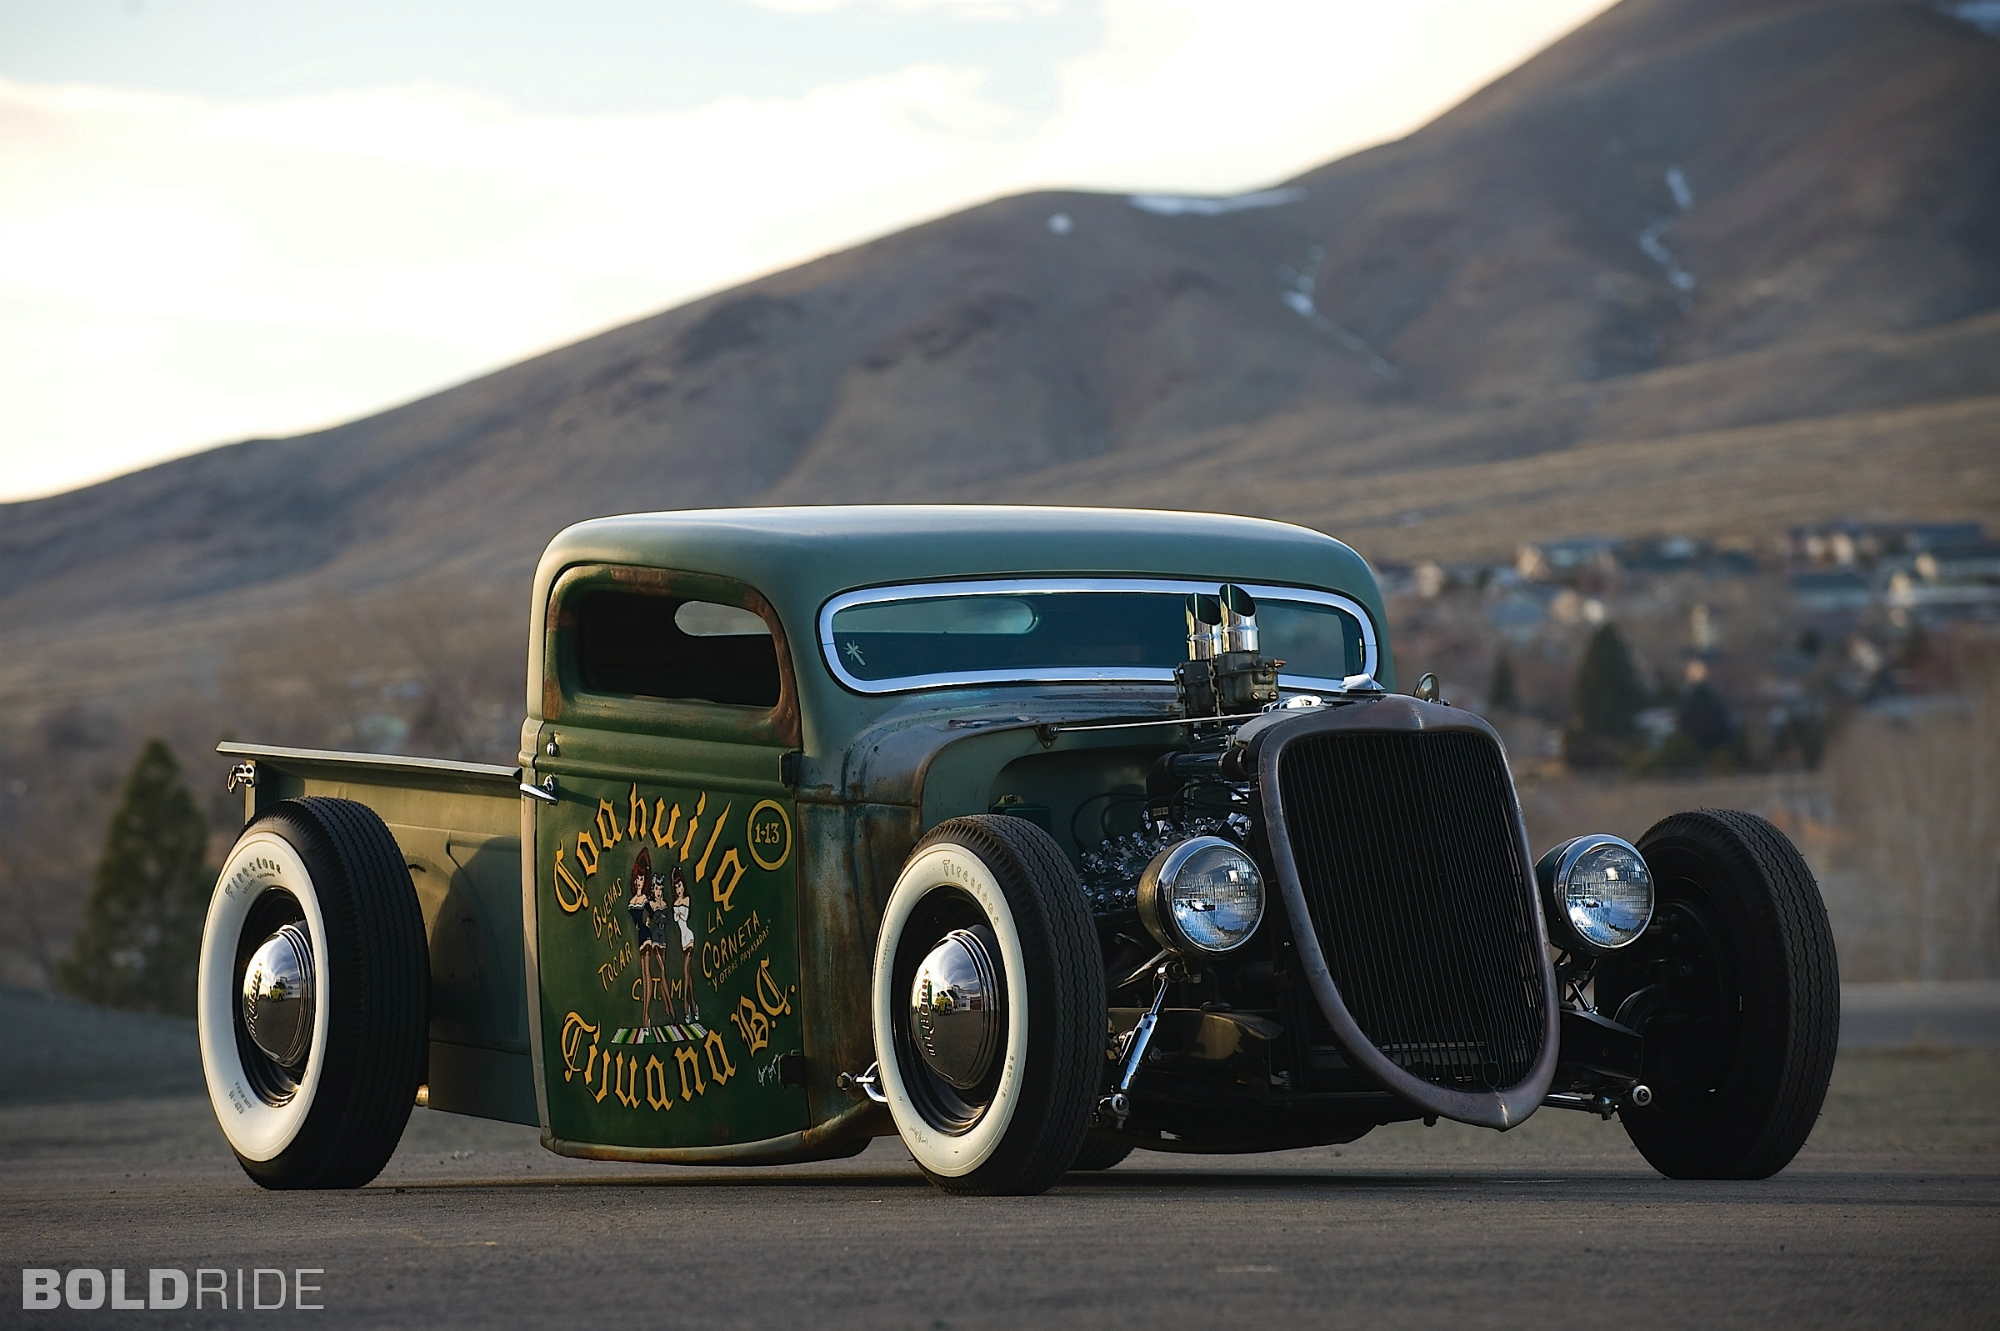 1935 Ford V8 Rat Rod Pickup wallpaper | 2000x1331 | 35955